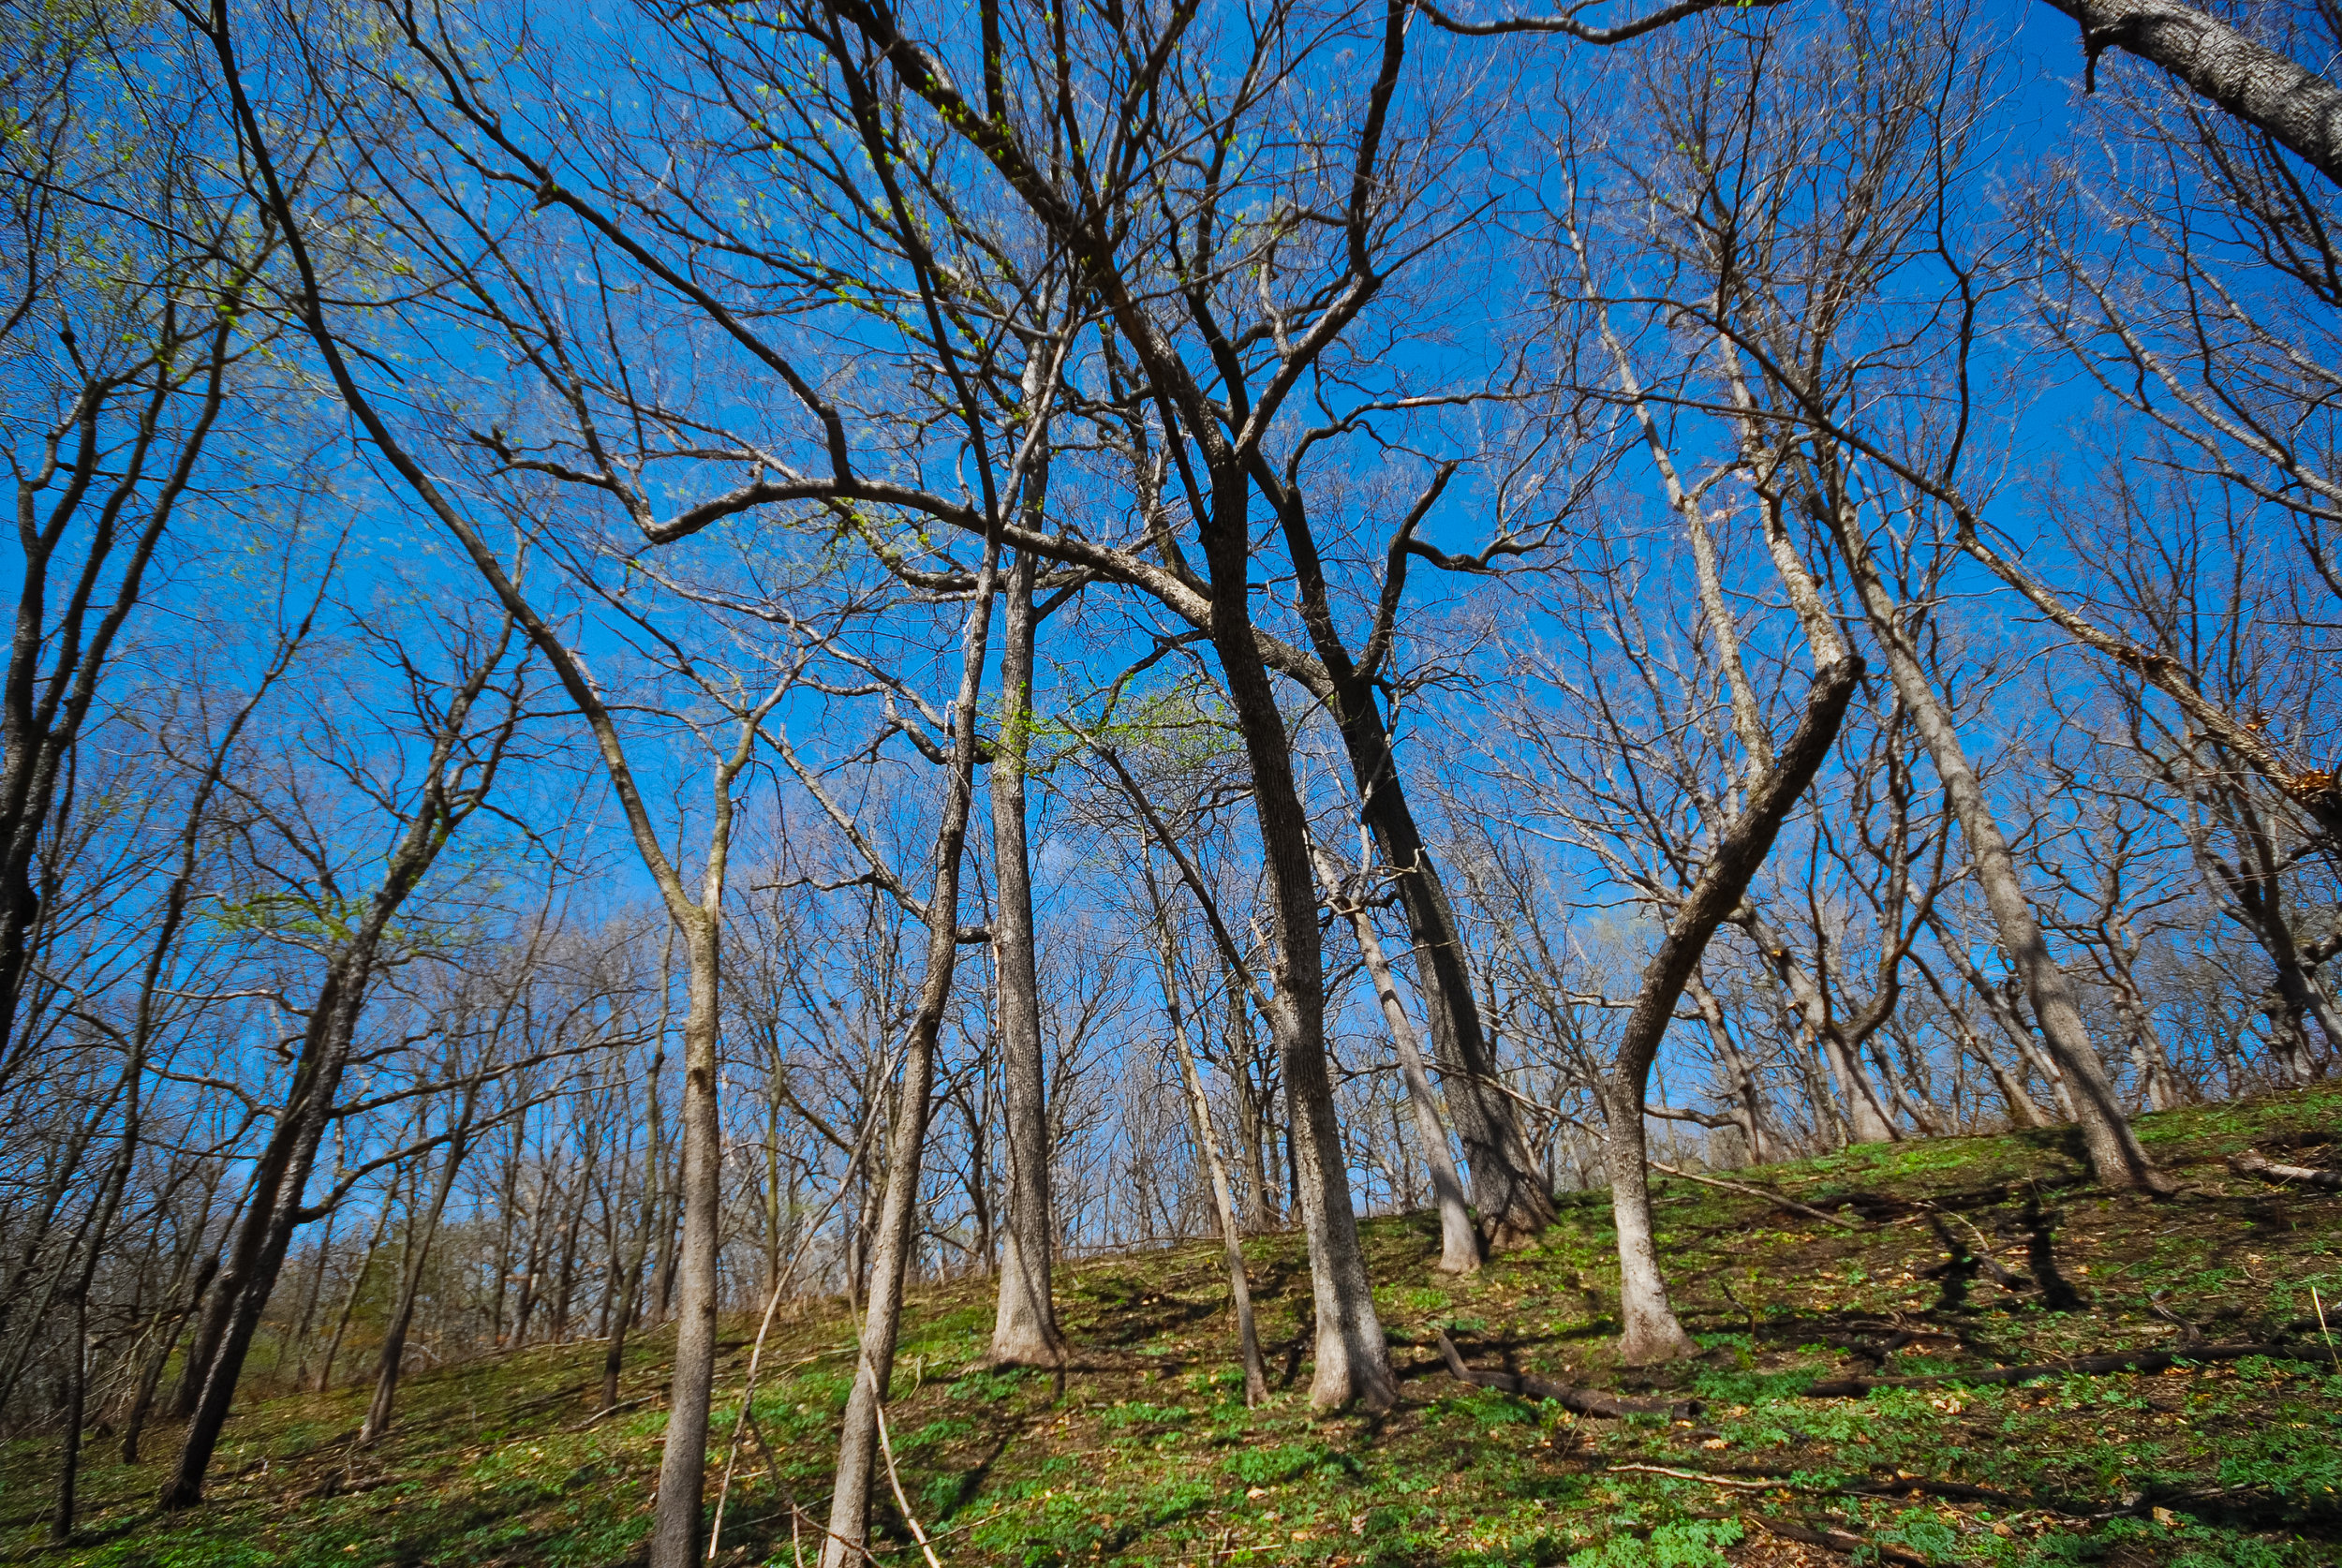 Spring in a Wisconsin oak savanna, photo by Joshua Mayer